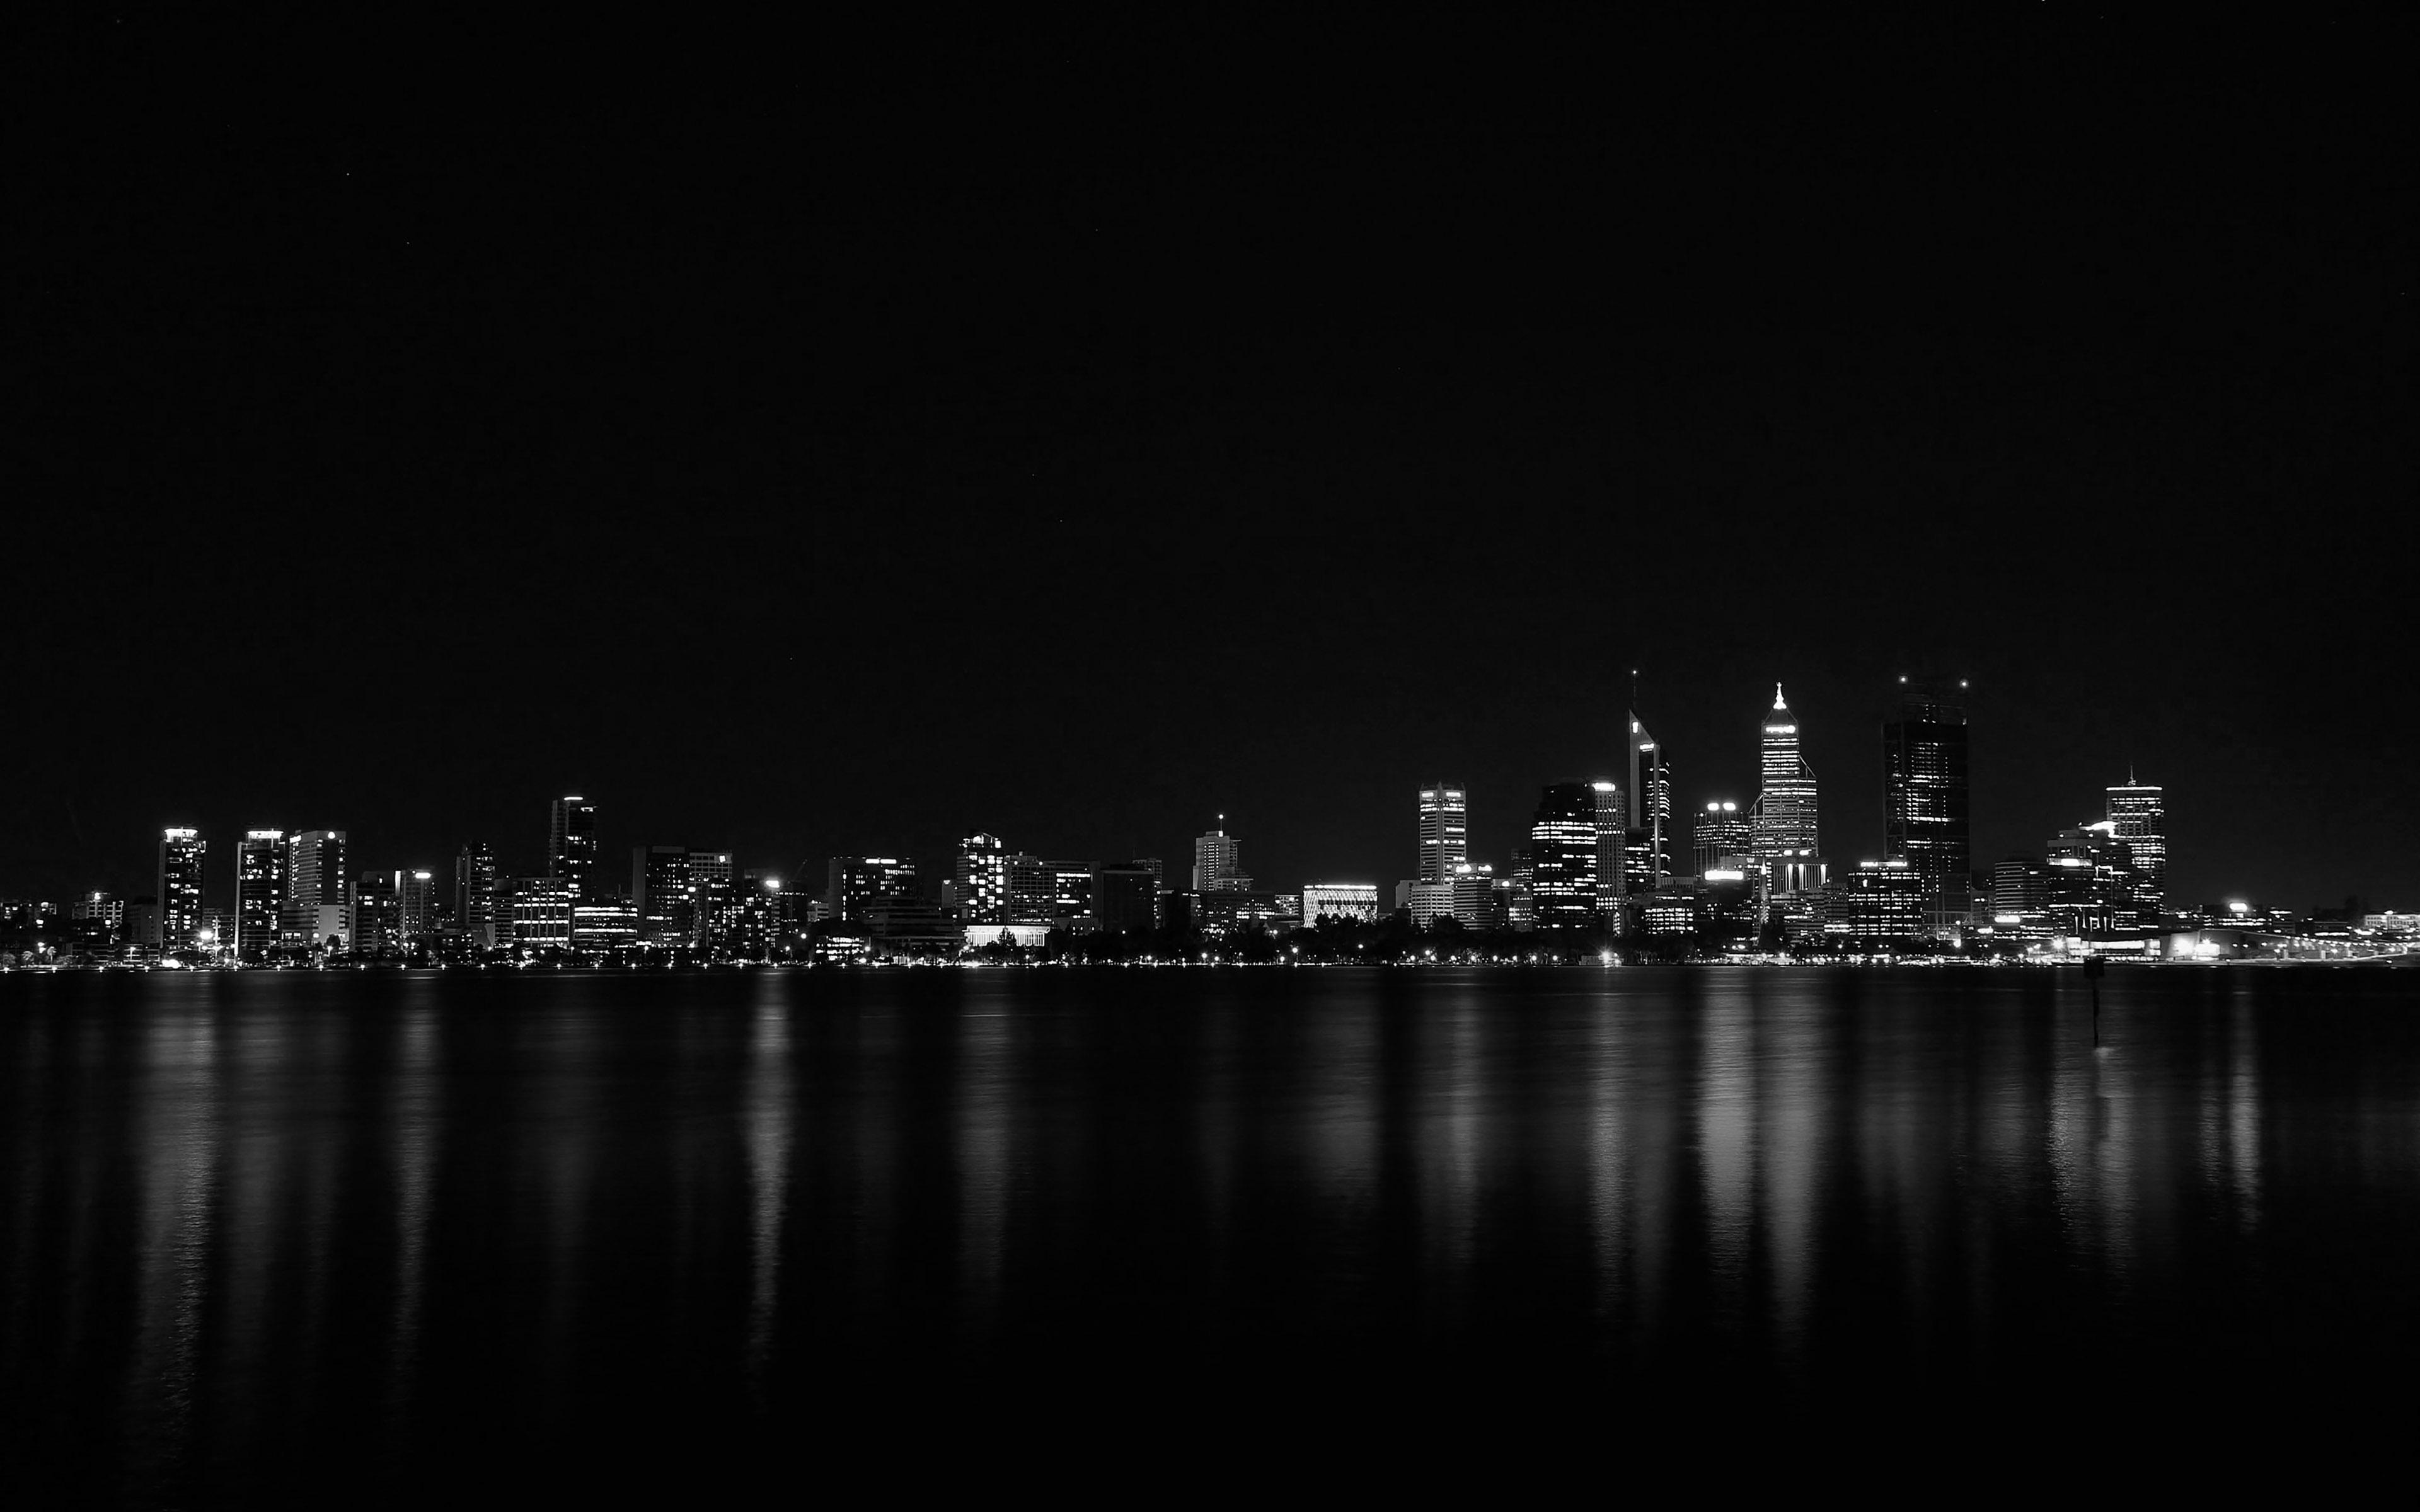 Mk52 City Night Dark Skyline Architecture River Wallpaper